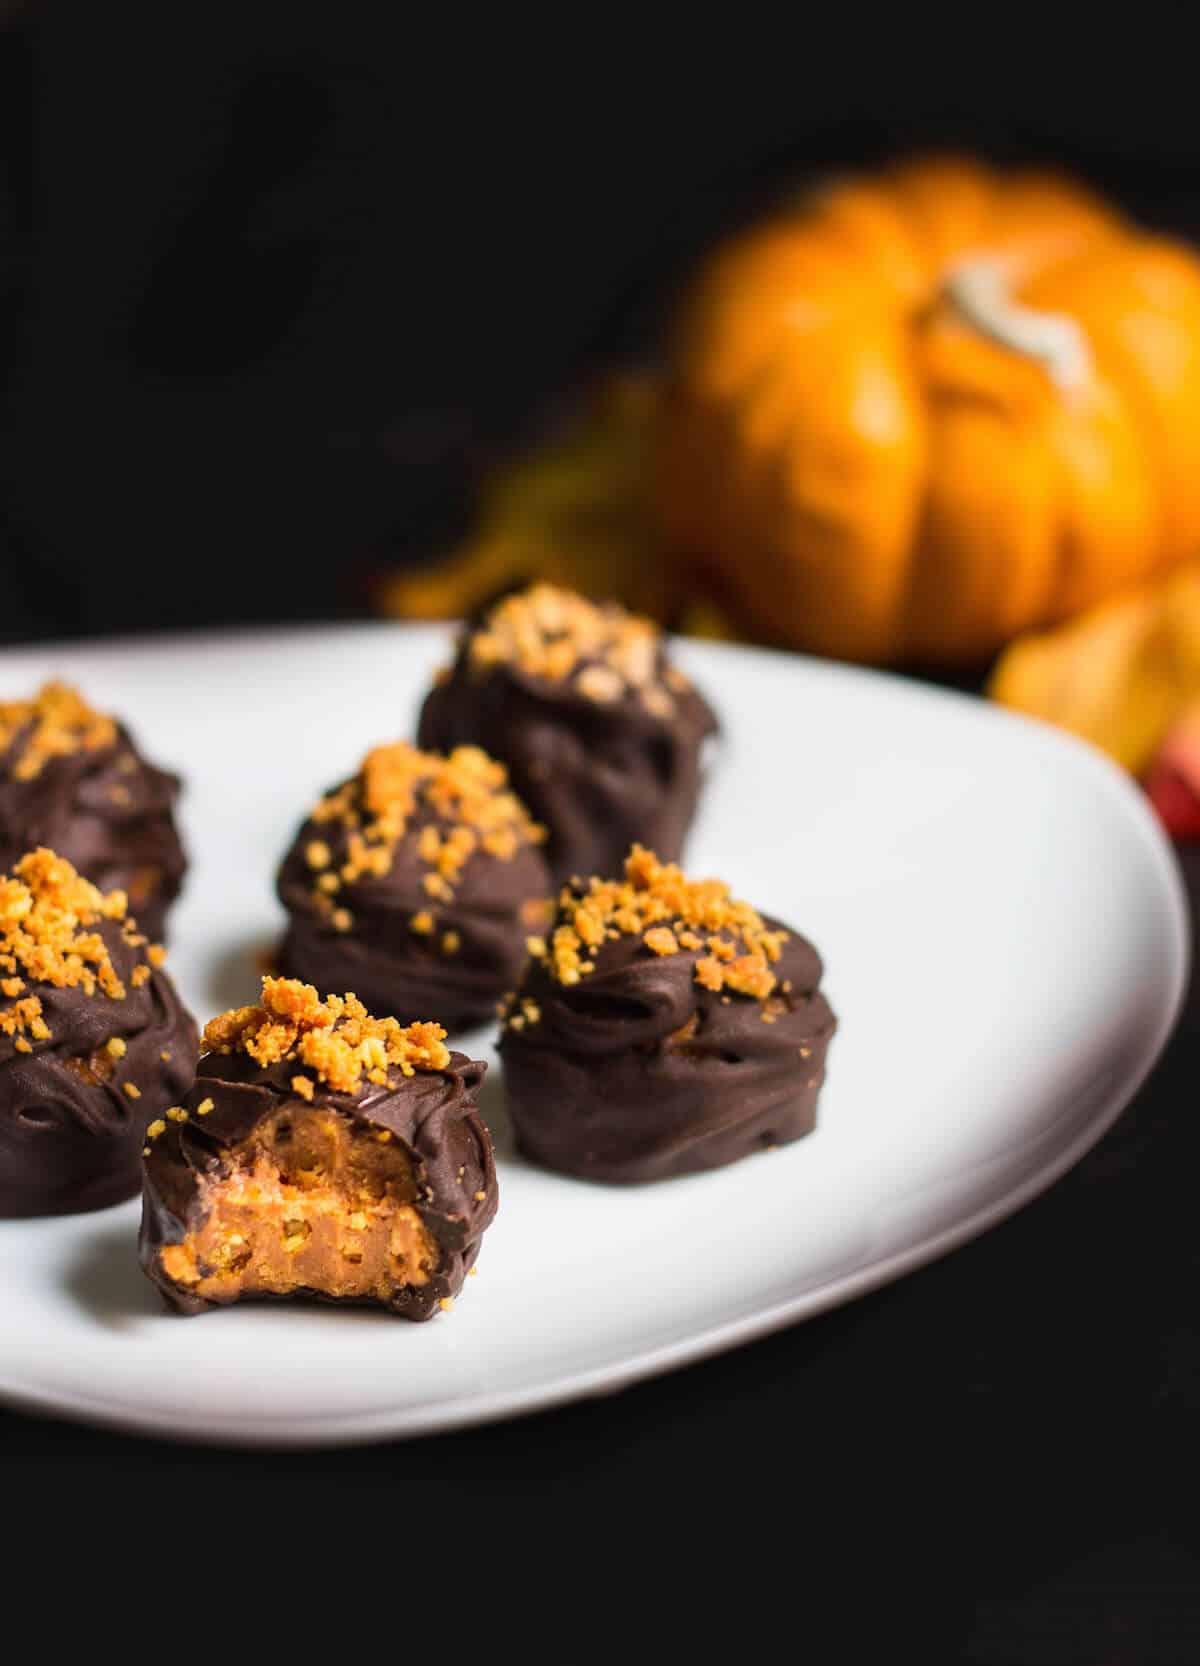 Oreo Truffles made with pumpkin spice oreos - close up shot of inside truffle